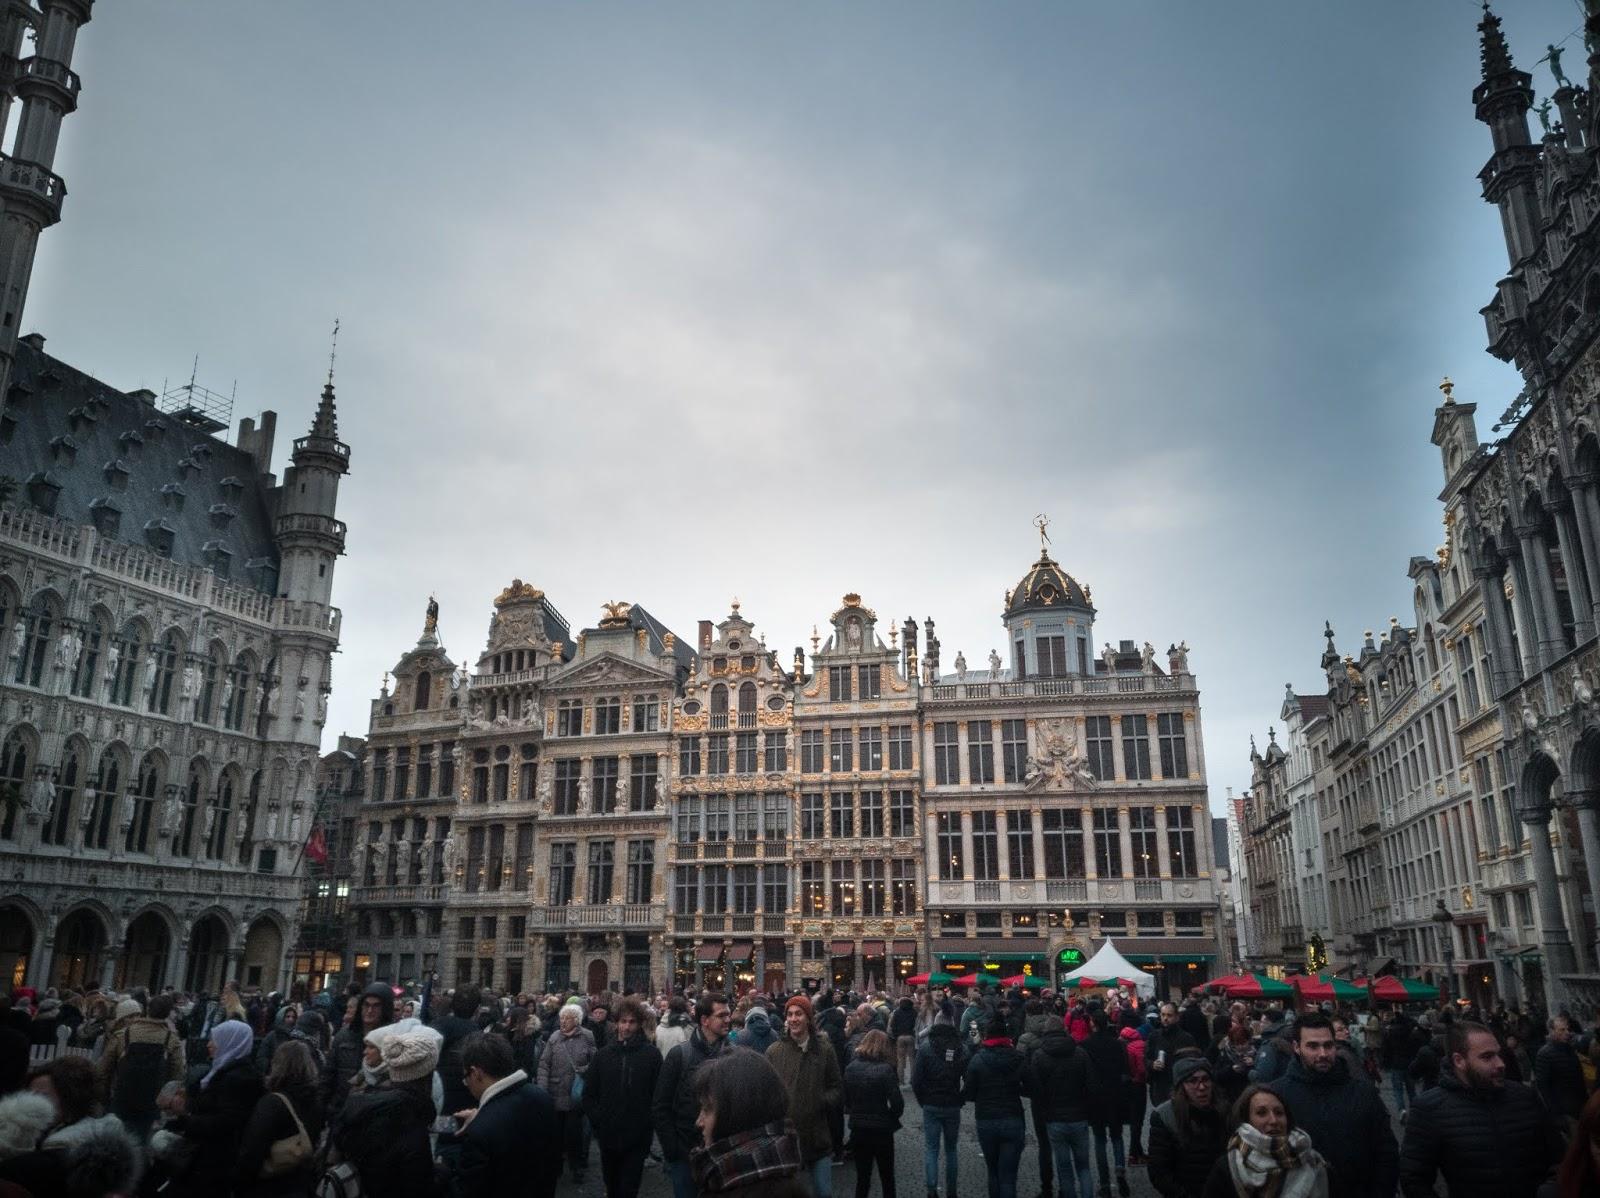 gran place bruxelas